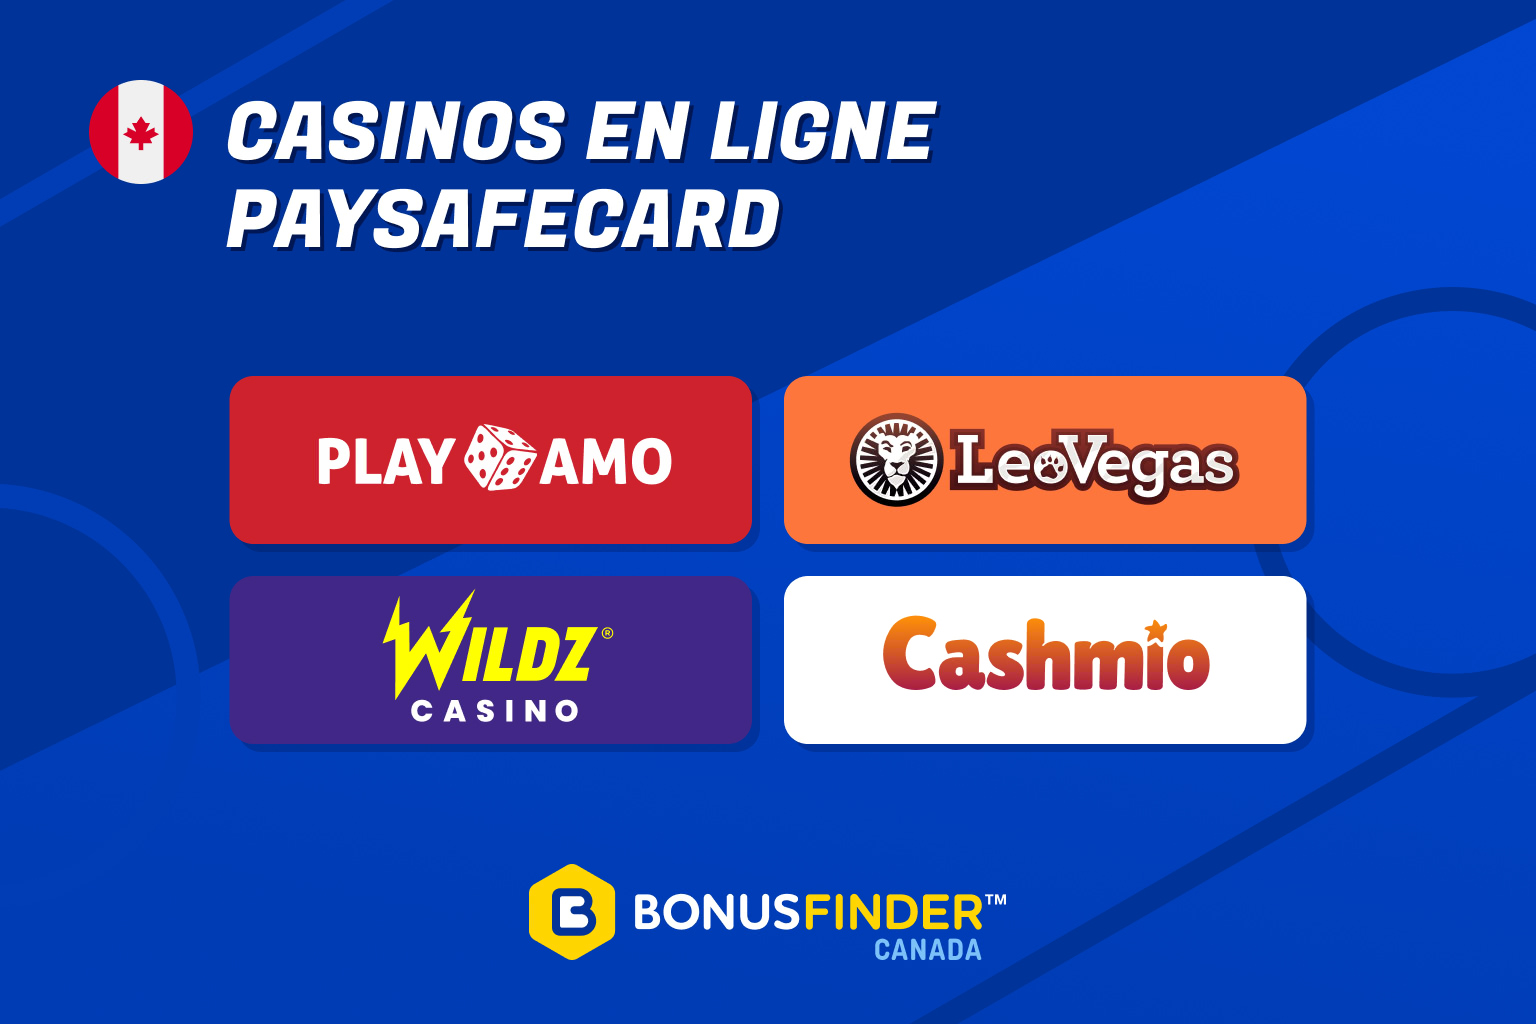 casino en ligne paysafecard